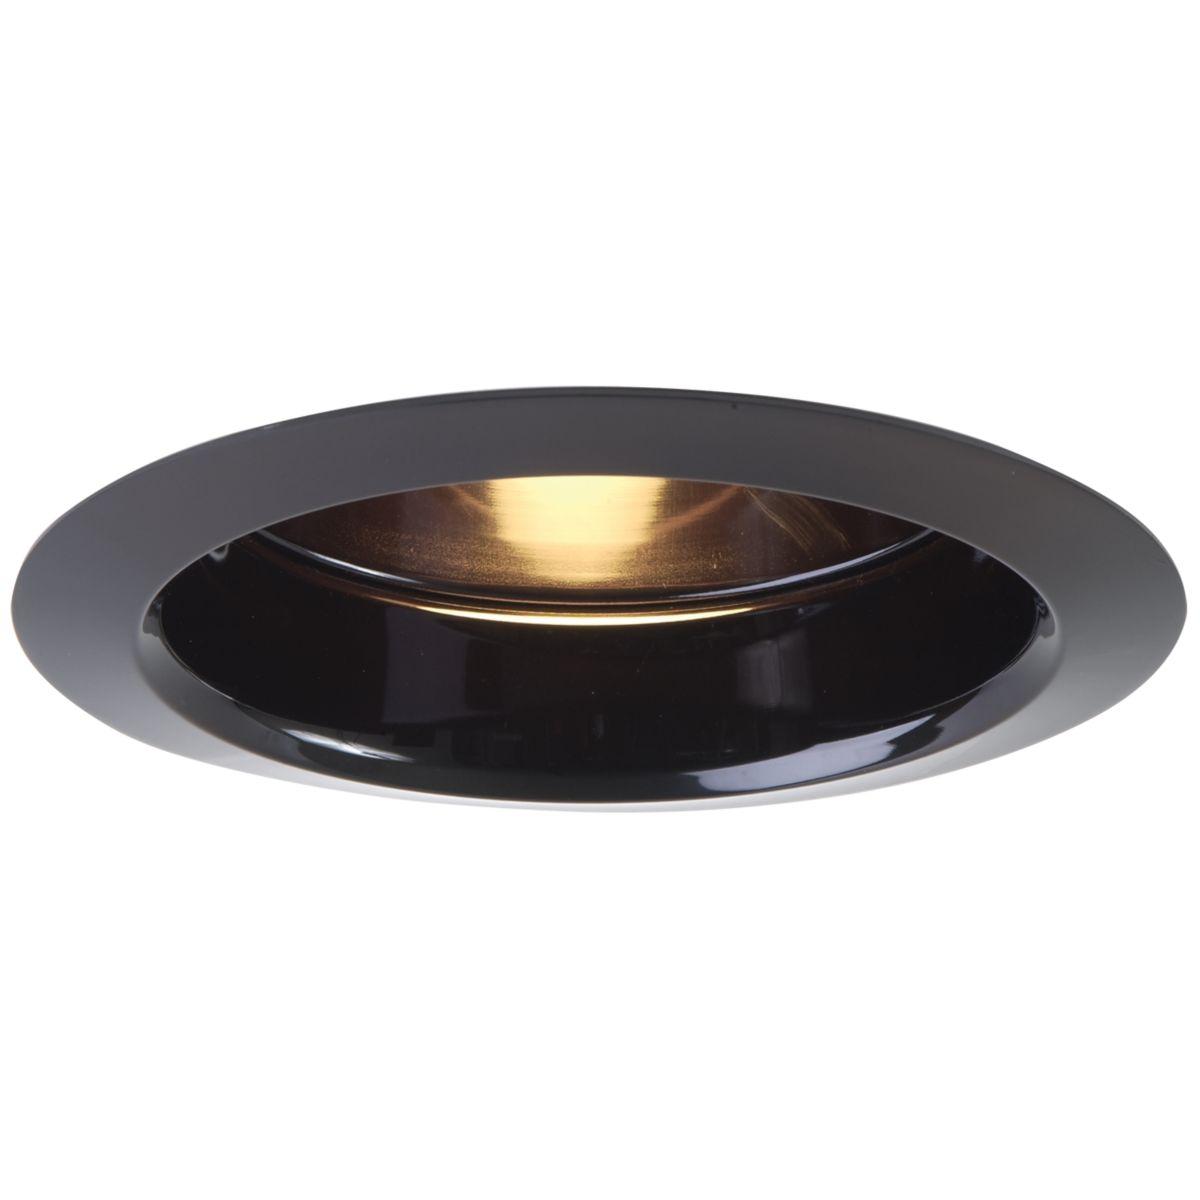 30SBAT Super Trim AIR-TITE™ Reflector